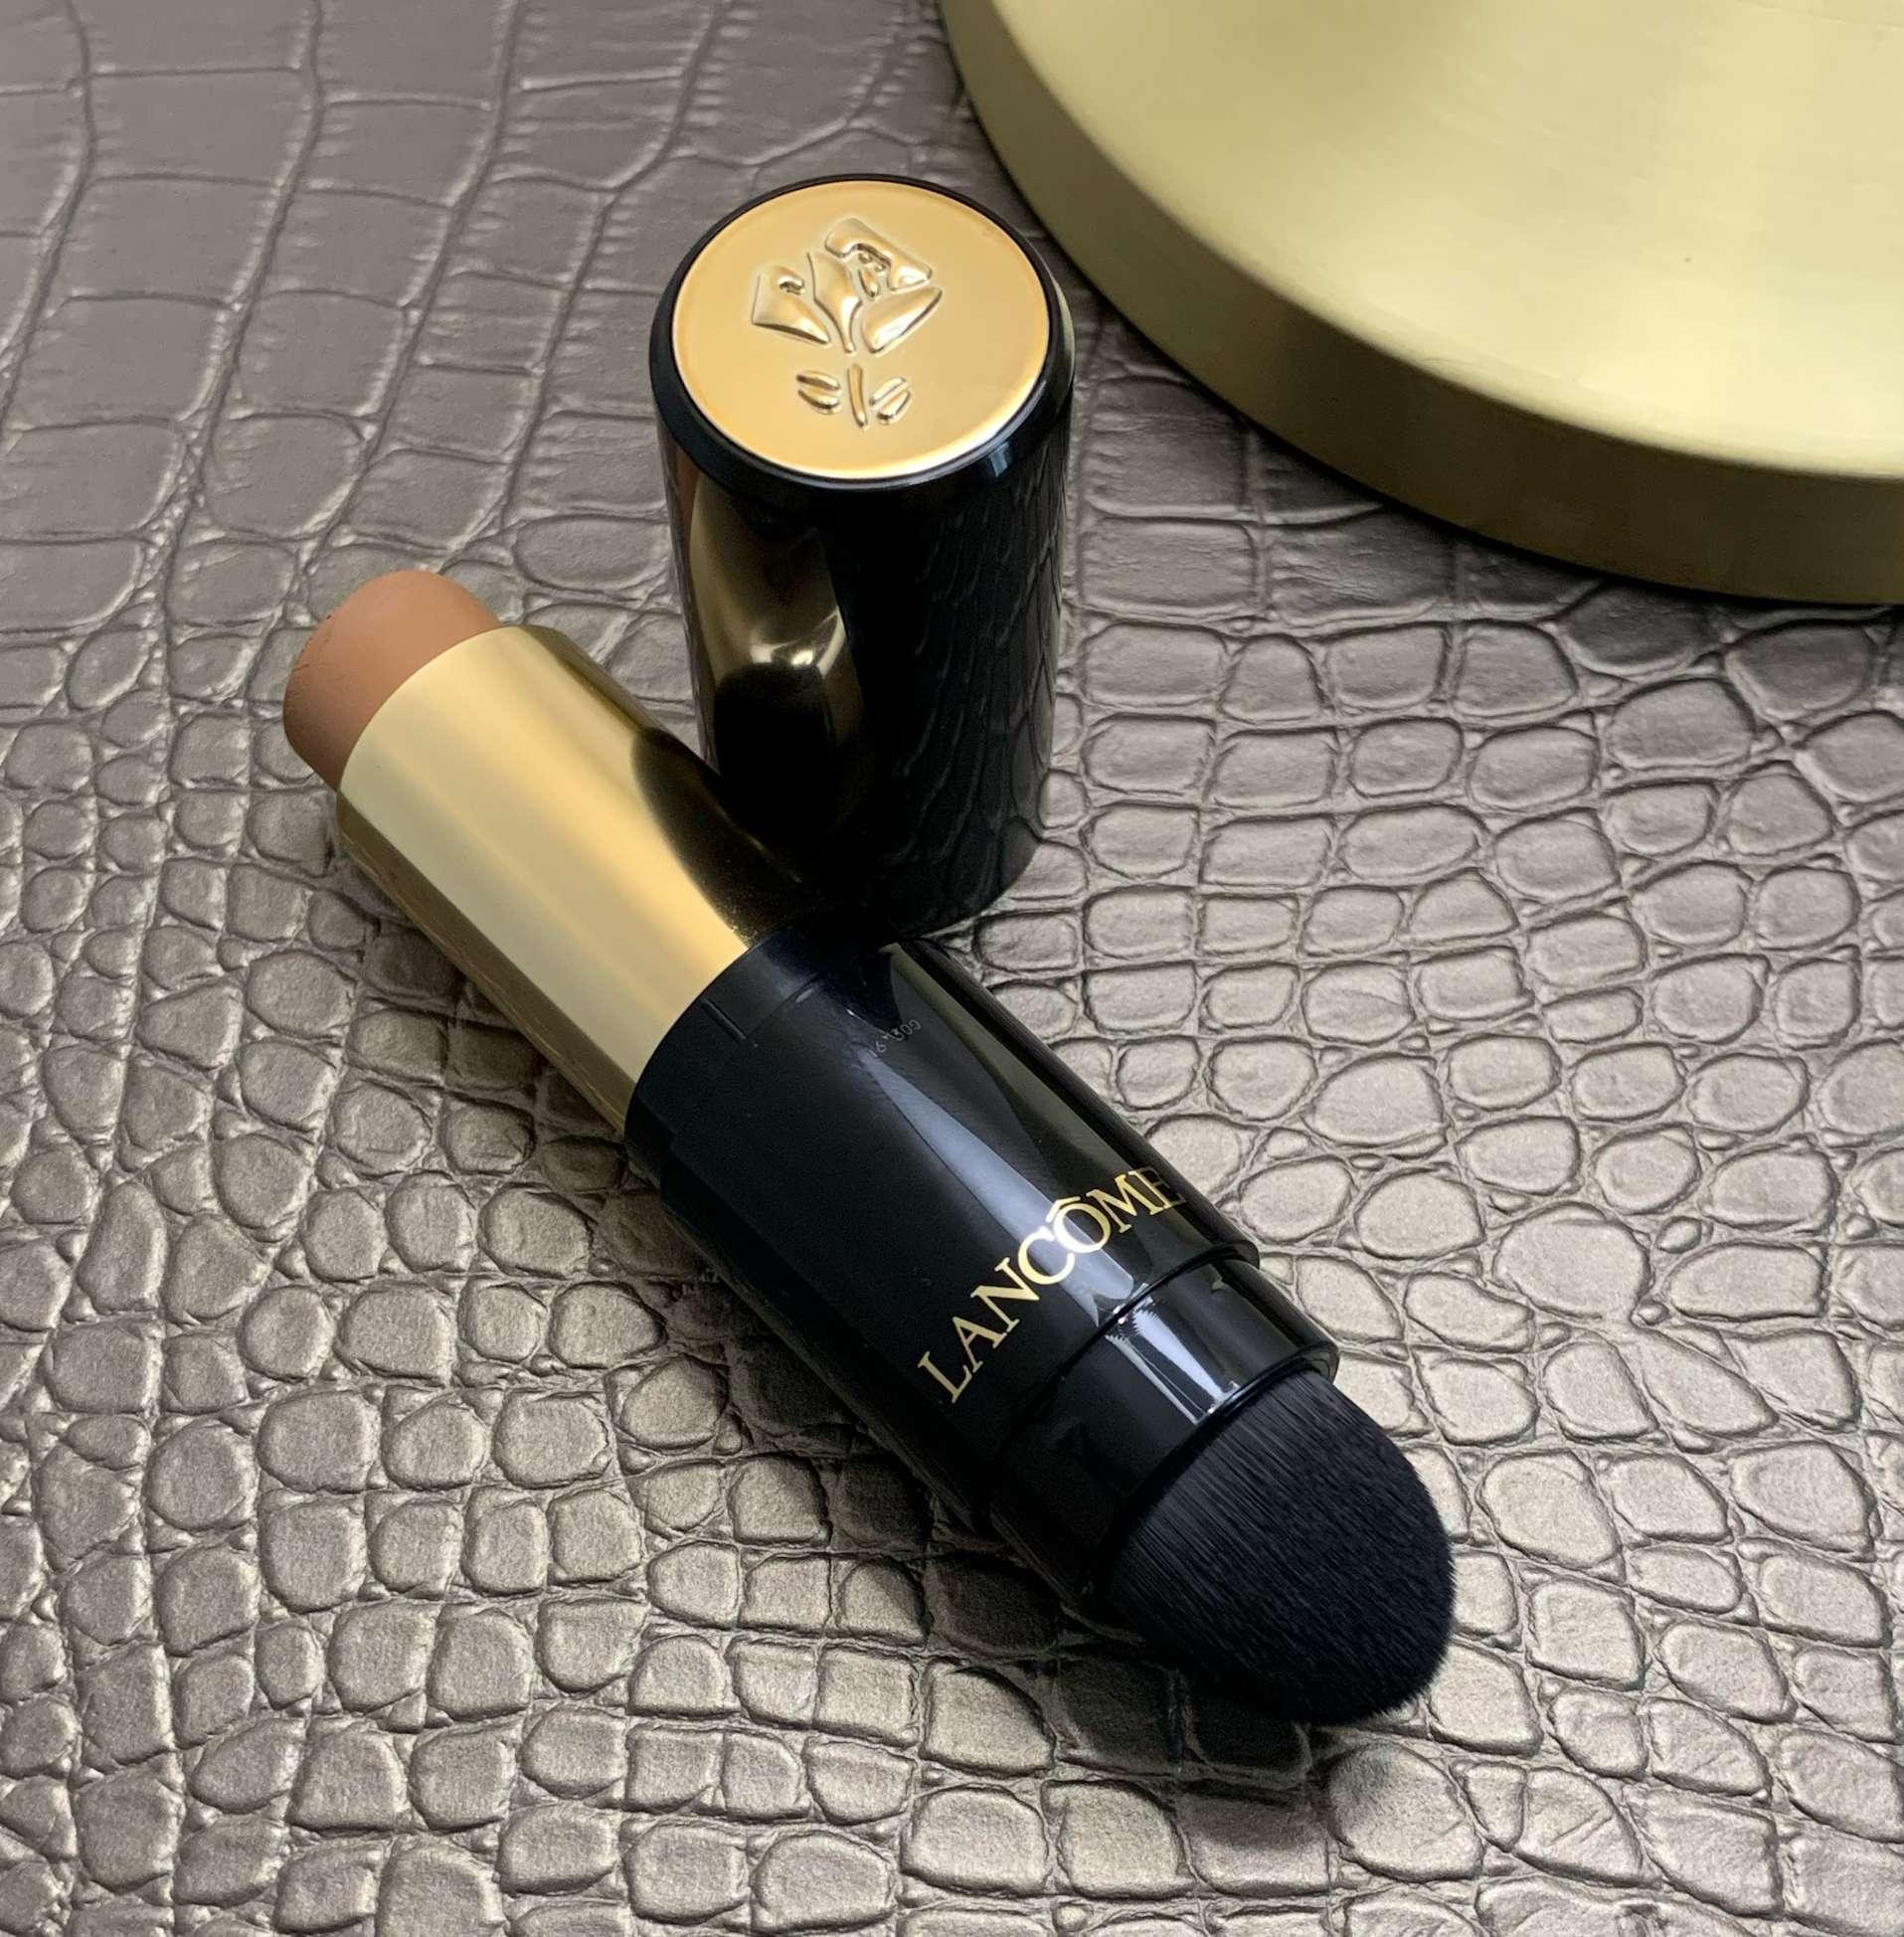 Lancome Teint Idole Ultra Wear Foundation Stick 450 Suede Neutral Swatch